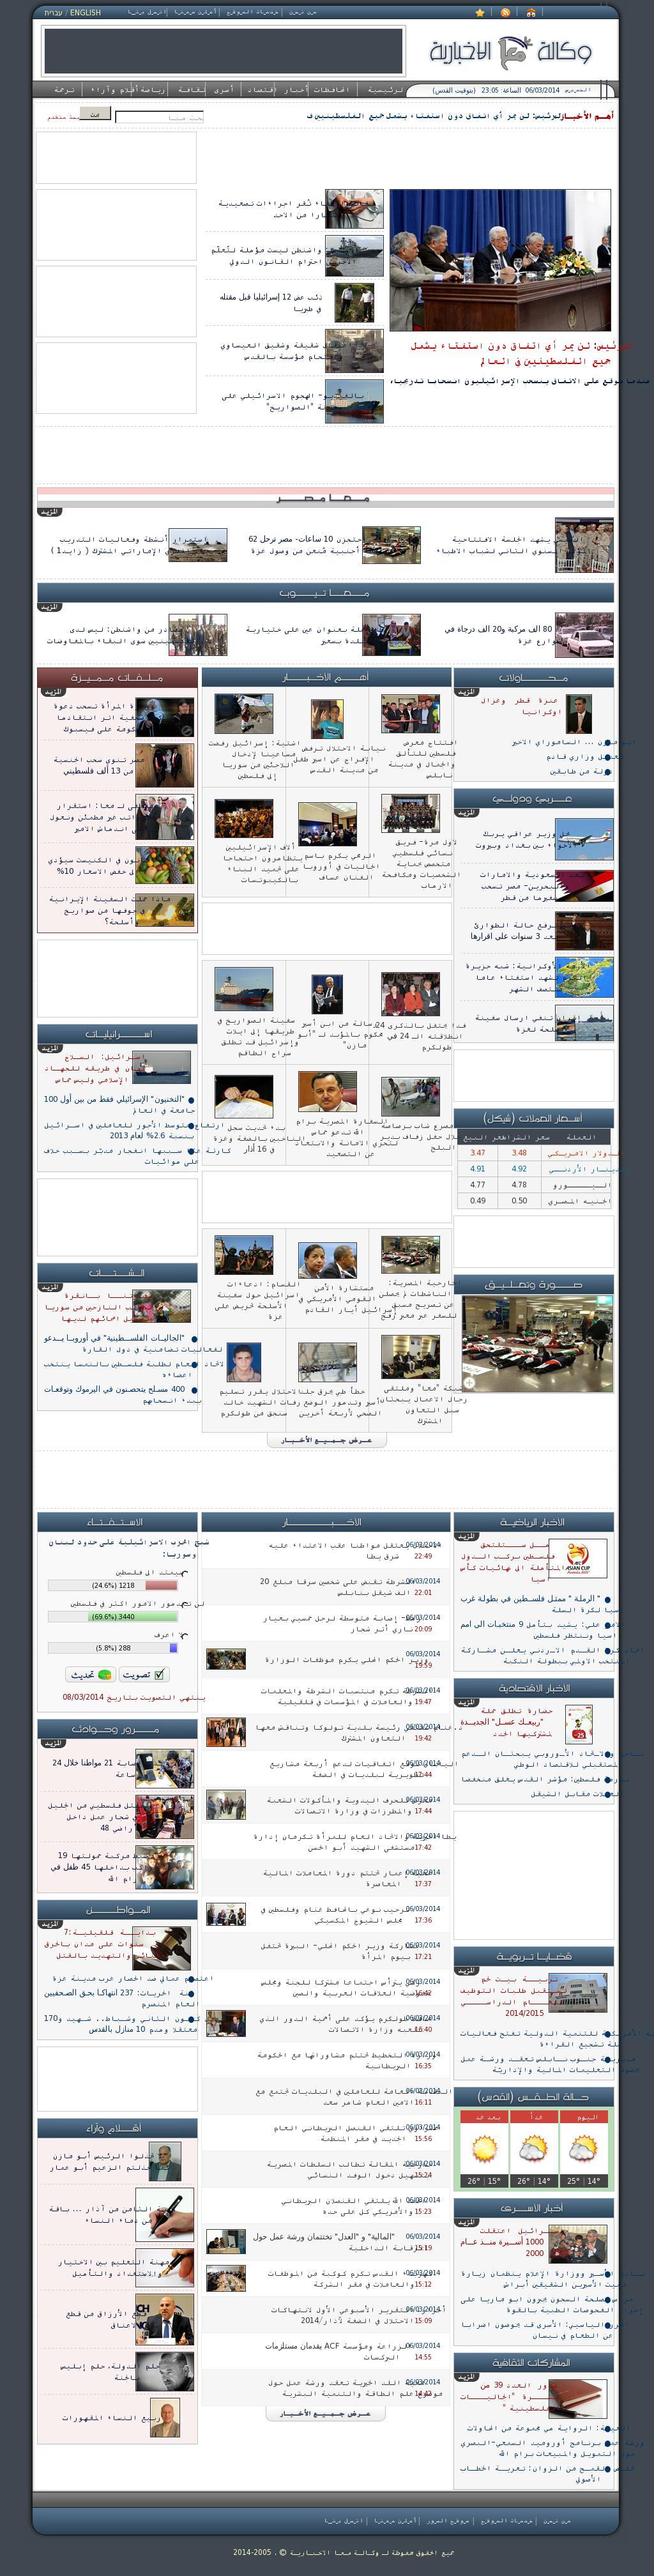 Ma'an News at Thursday March 6, 2014, 9:09 p.m. UTC